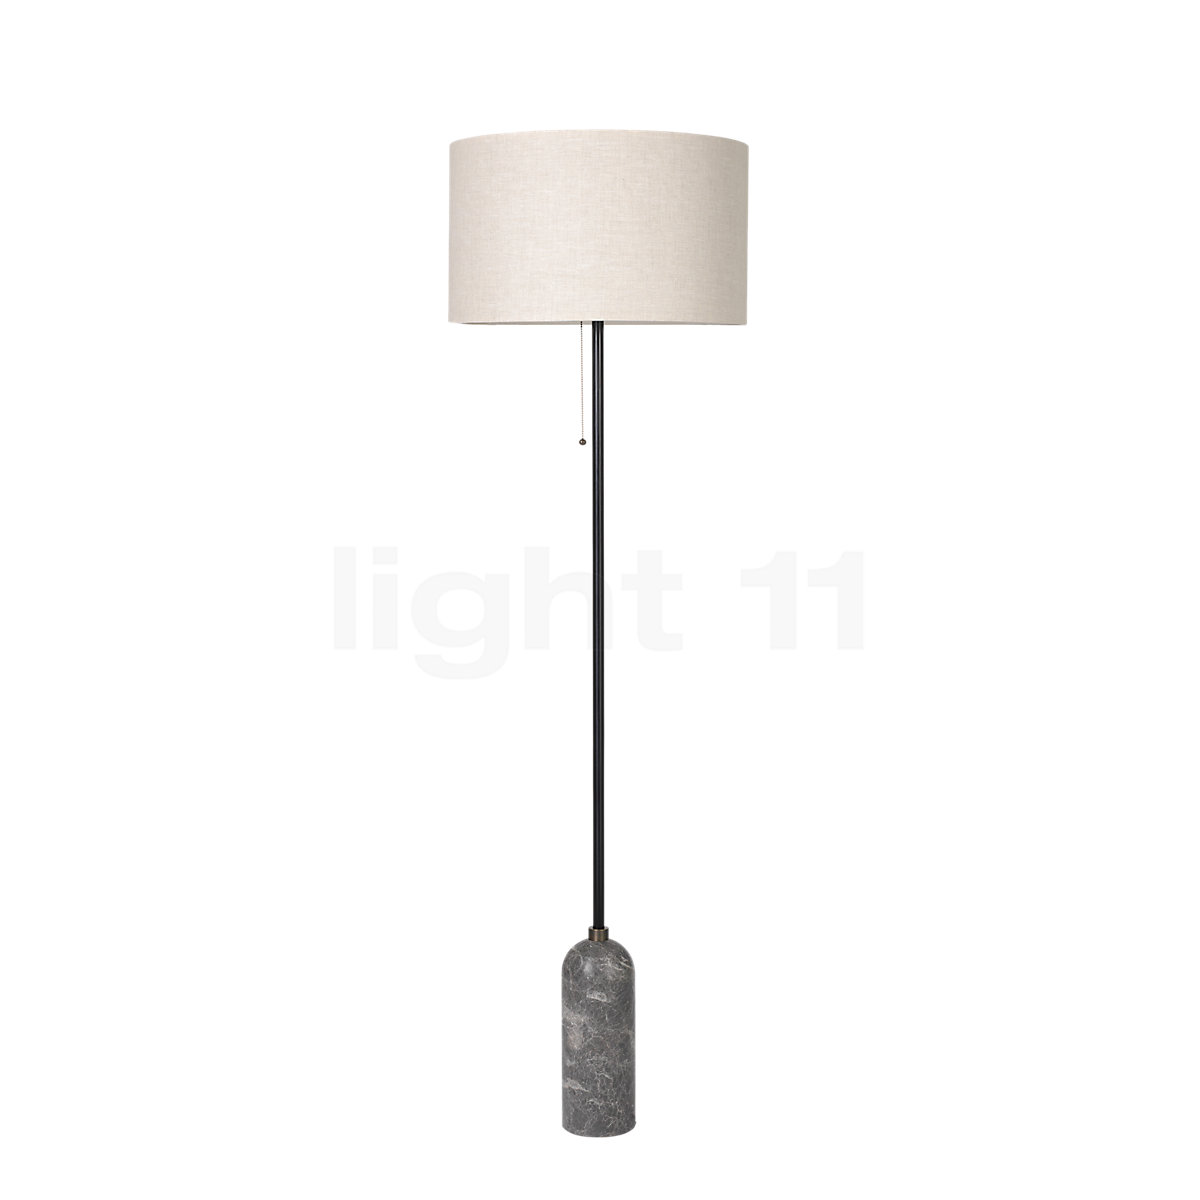 pie light11 Gubi Gravitylámpara en es de 8nwXNZ0OPk